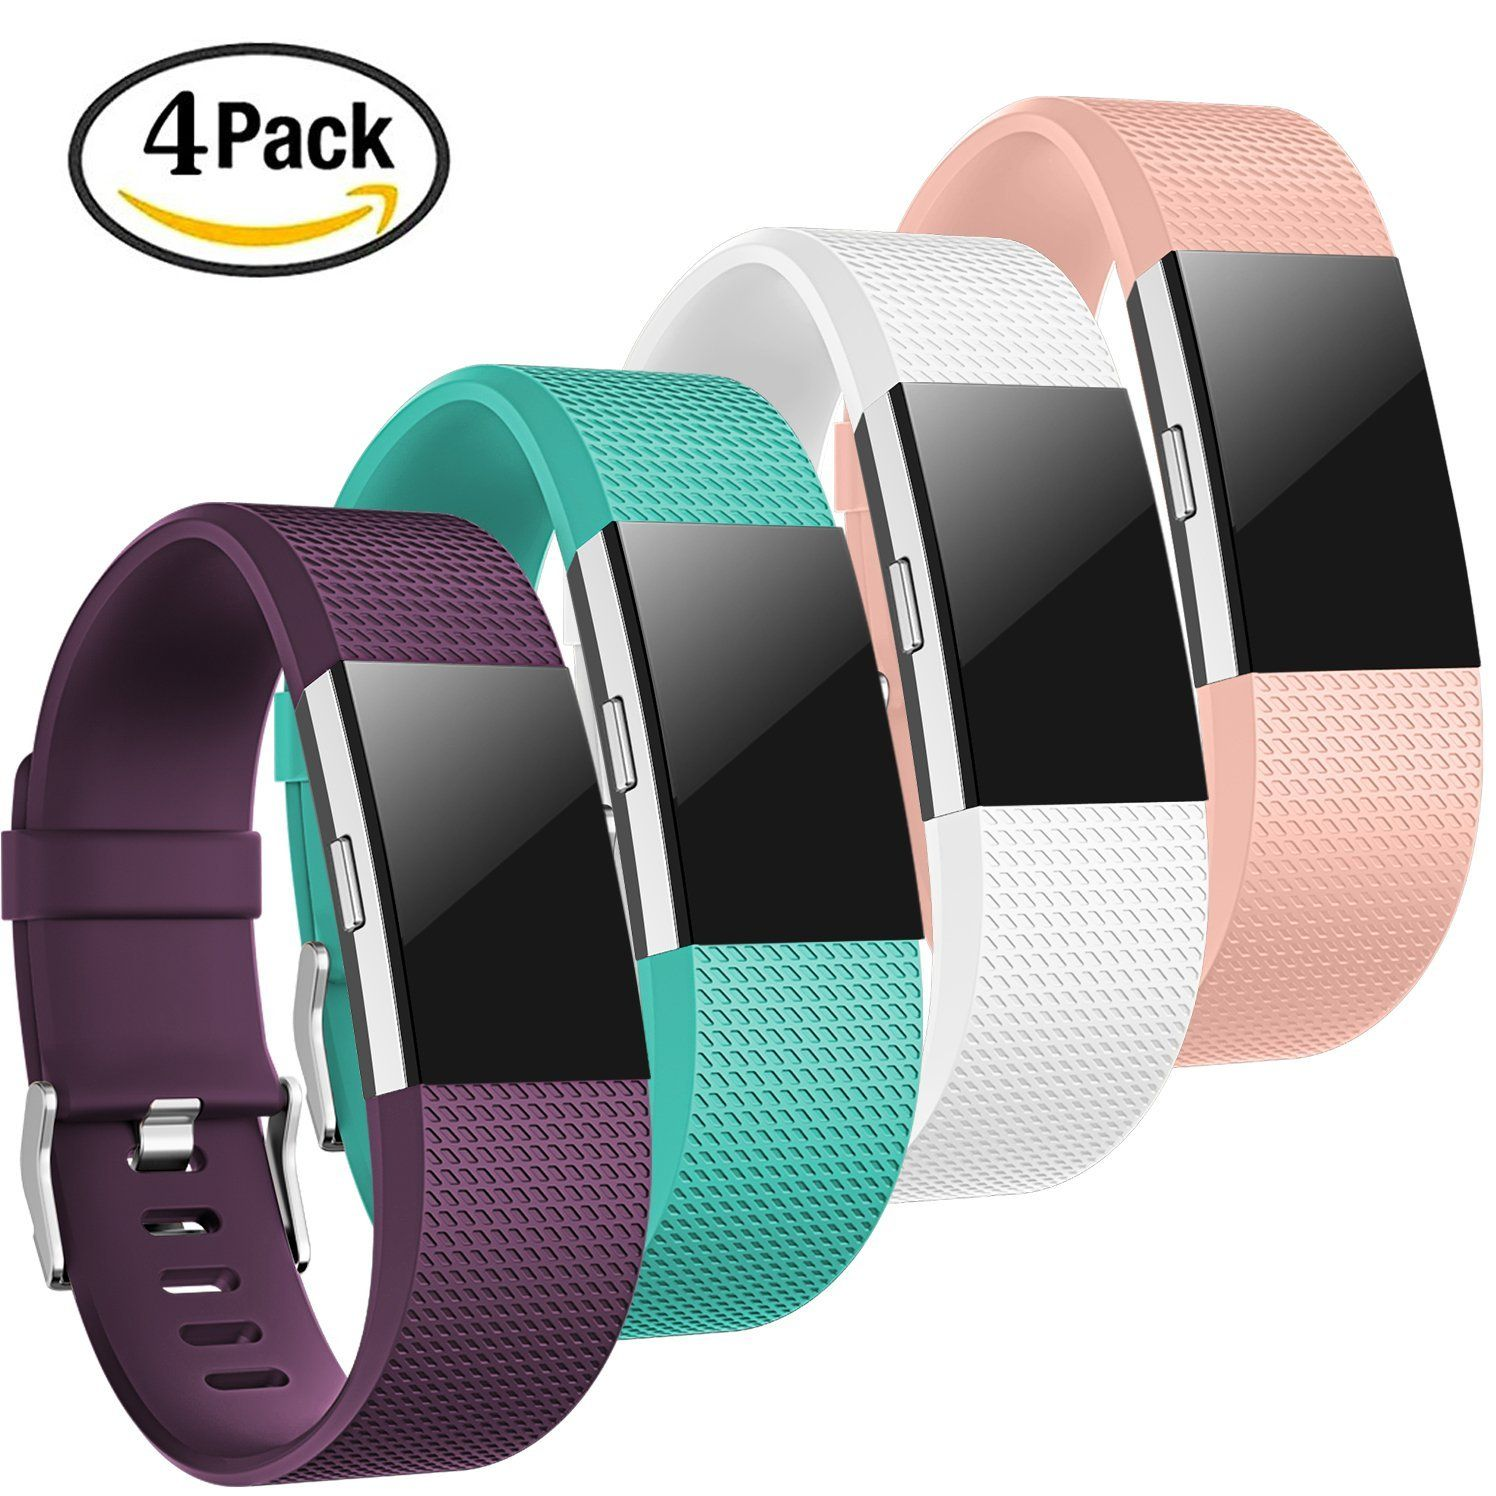 Amazon com : For Fitbit Charge 2 Bands, TreasureMax 4PCS